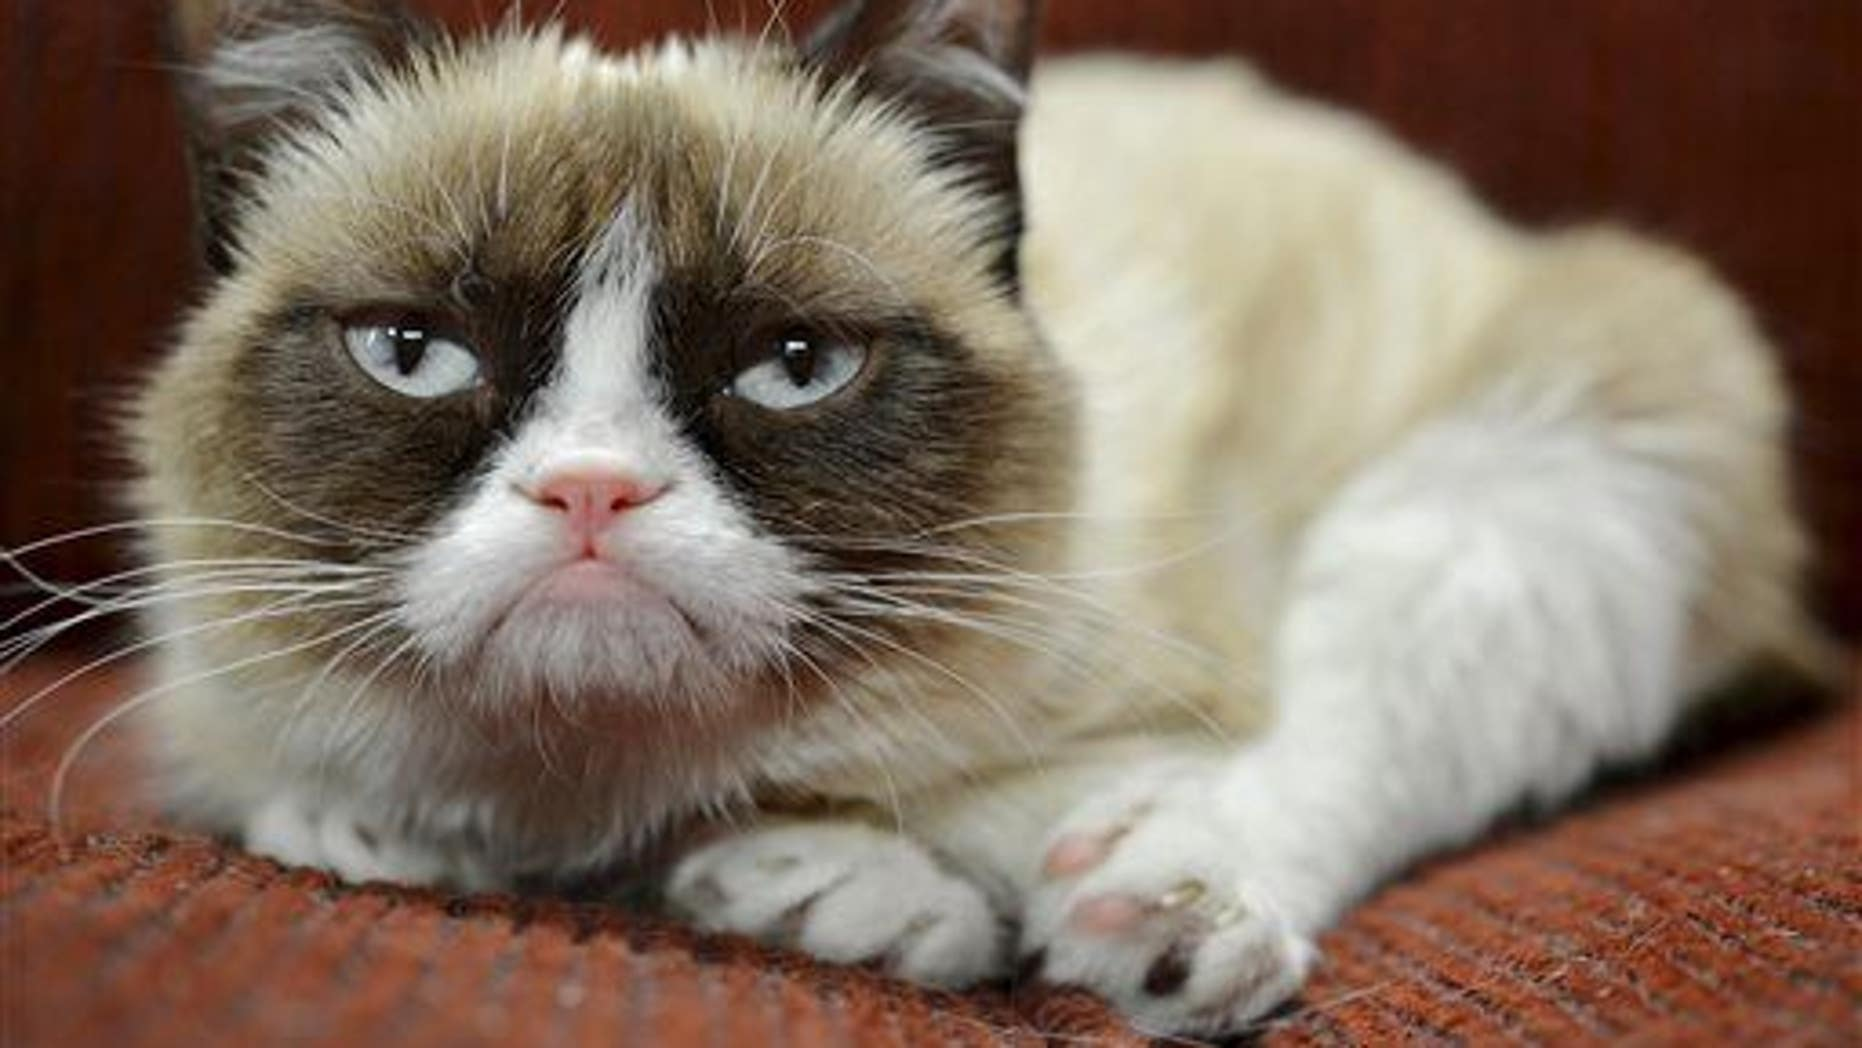 Maybe Grumpy Cat just needs more happy feline friends.